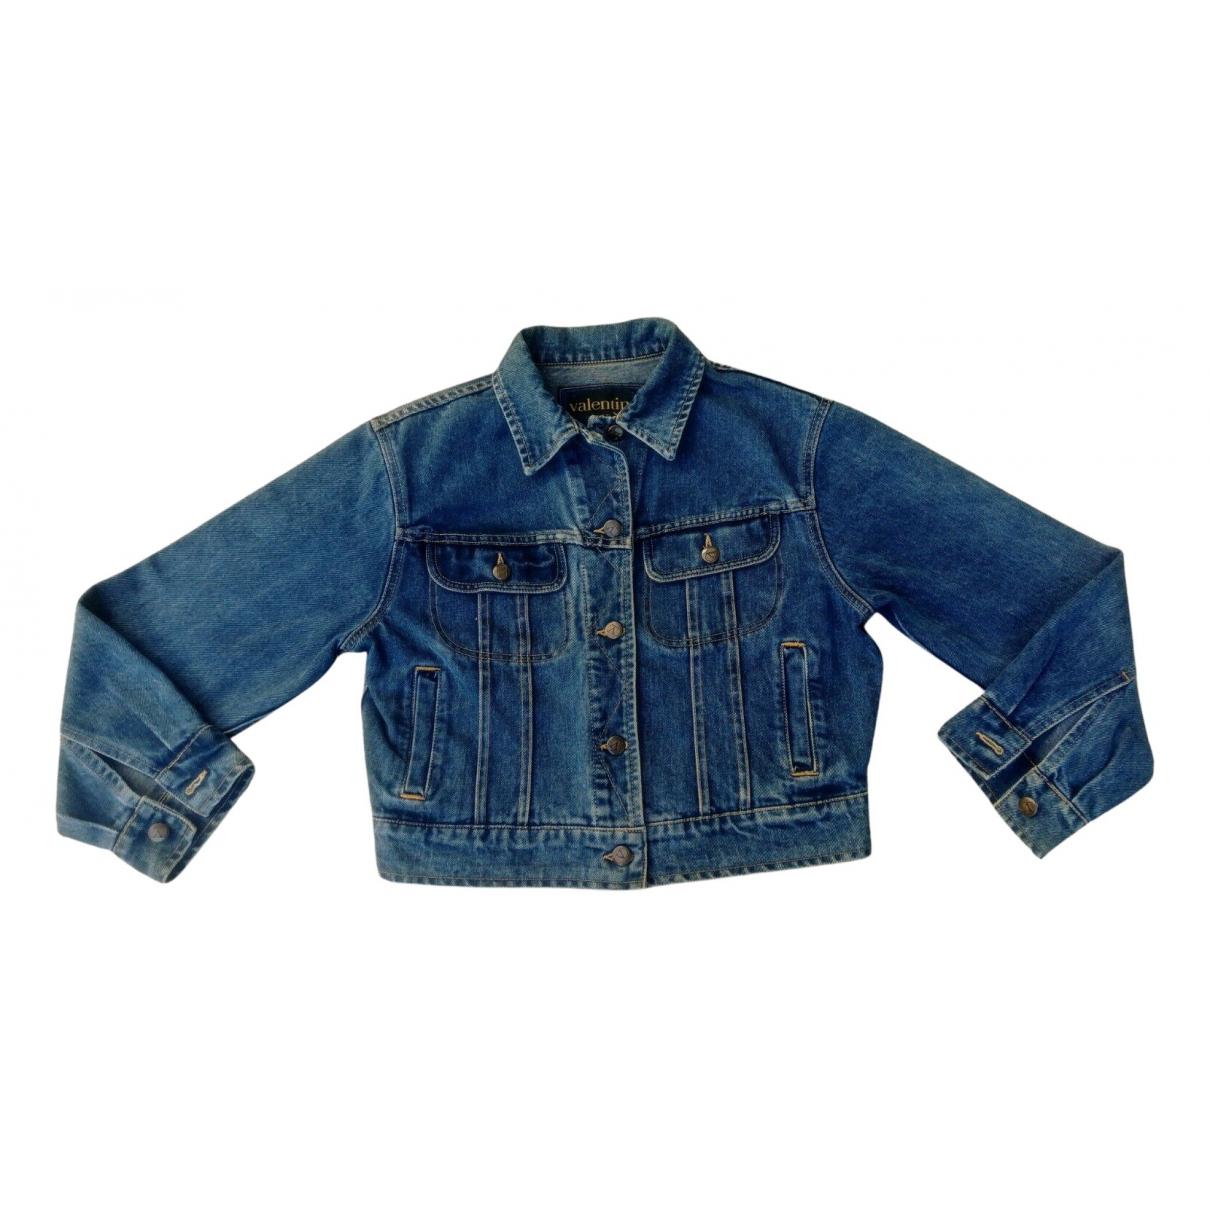 Valentino Garavani N Blue Denim - Jeans jacket for Women 36 FR